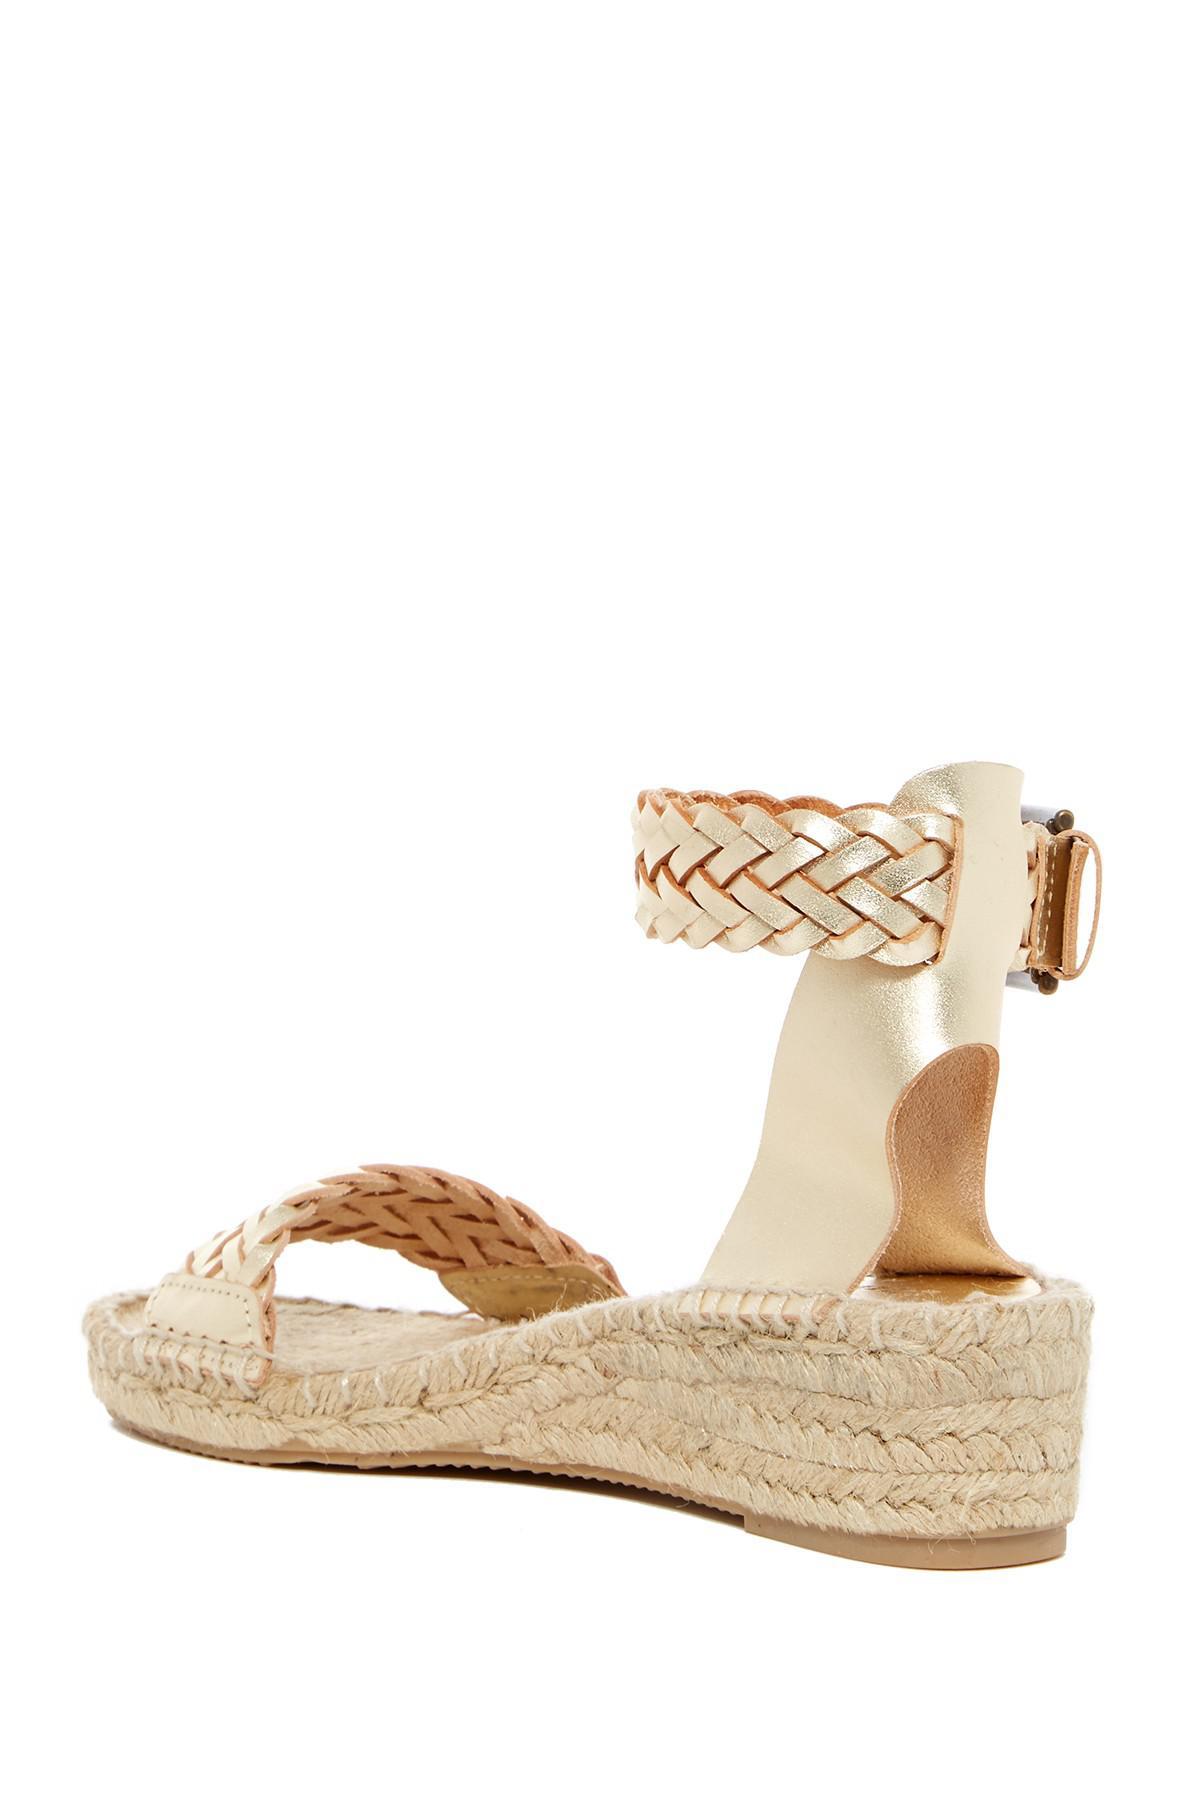 d342fa3b338 Lyst - Soludos Woven Open Toe Demi Wedge Sandal